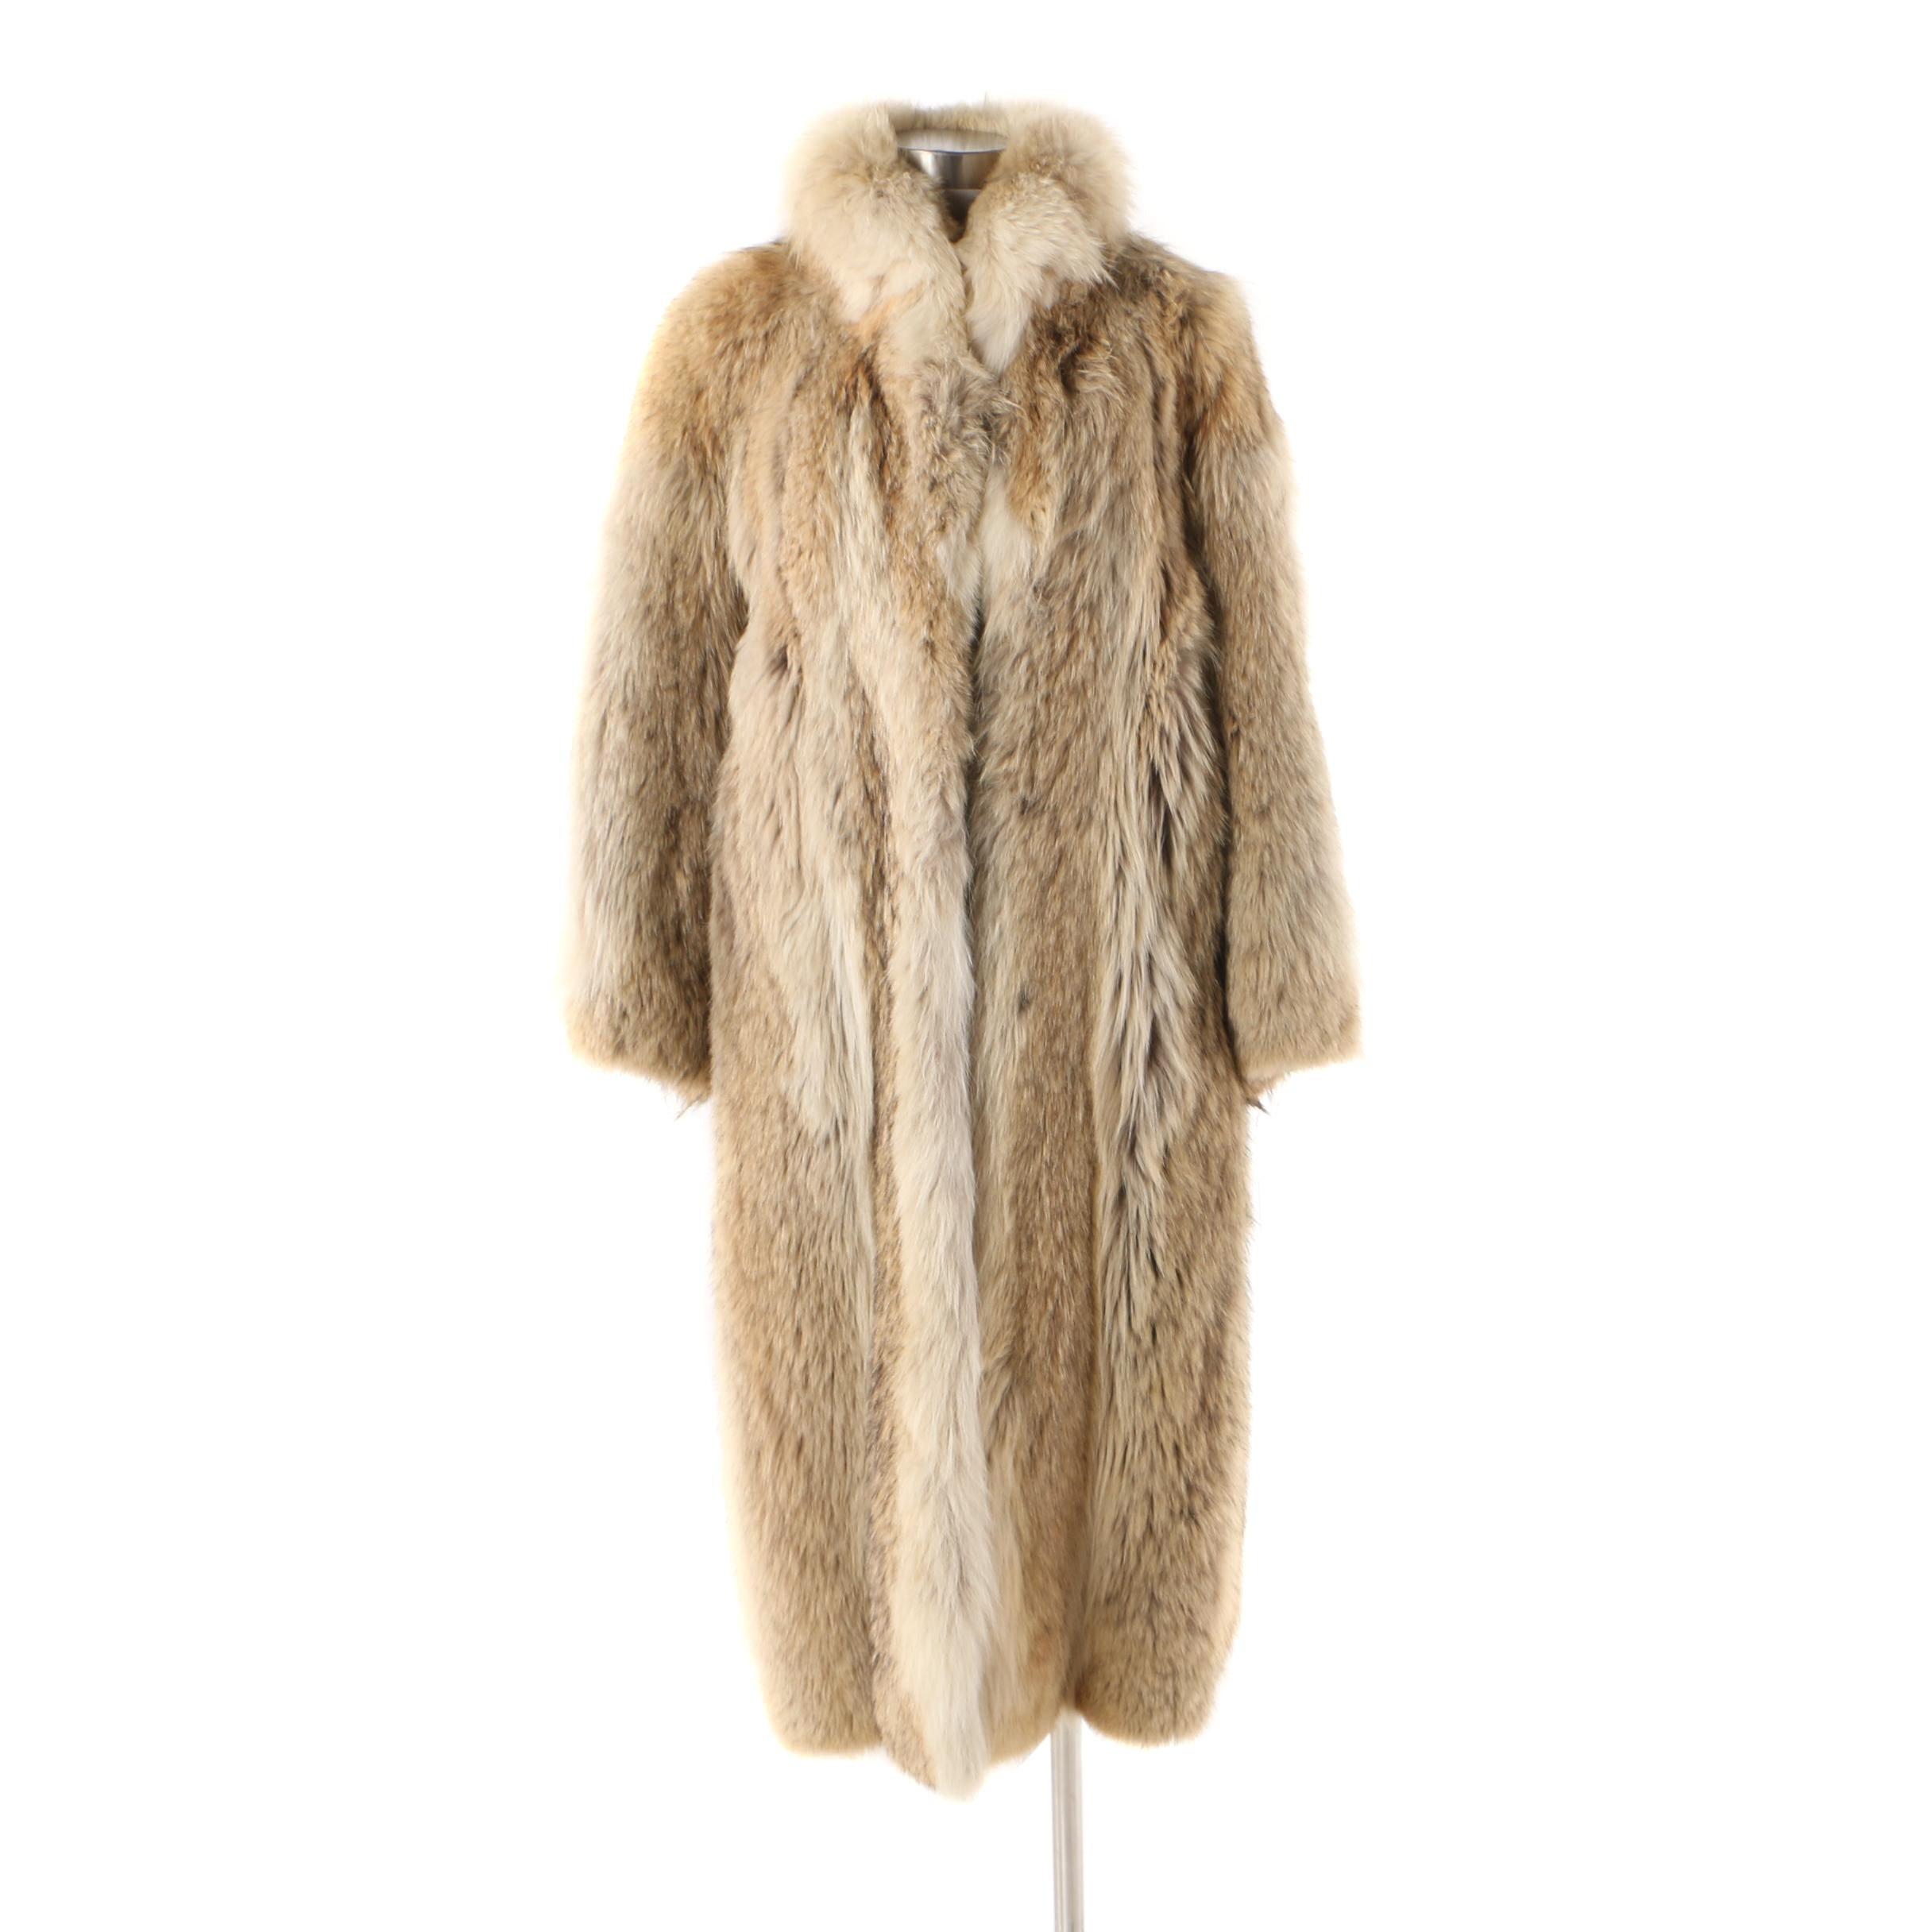 Women's 1970s Revillon for Saks Fifth Avenue Coyote Fur Coat